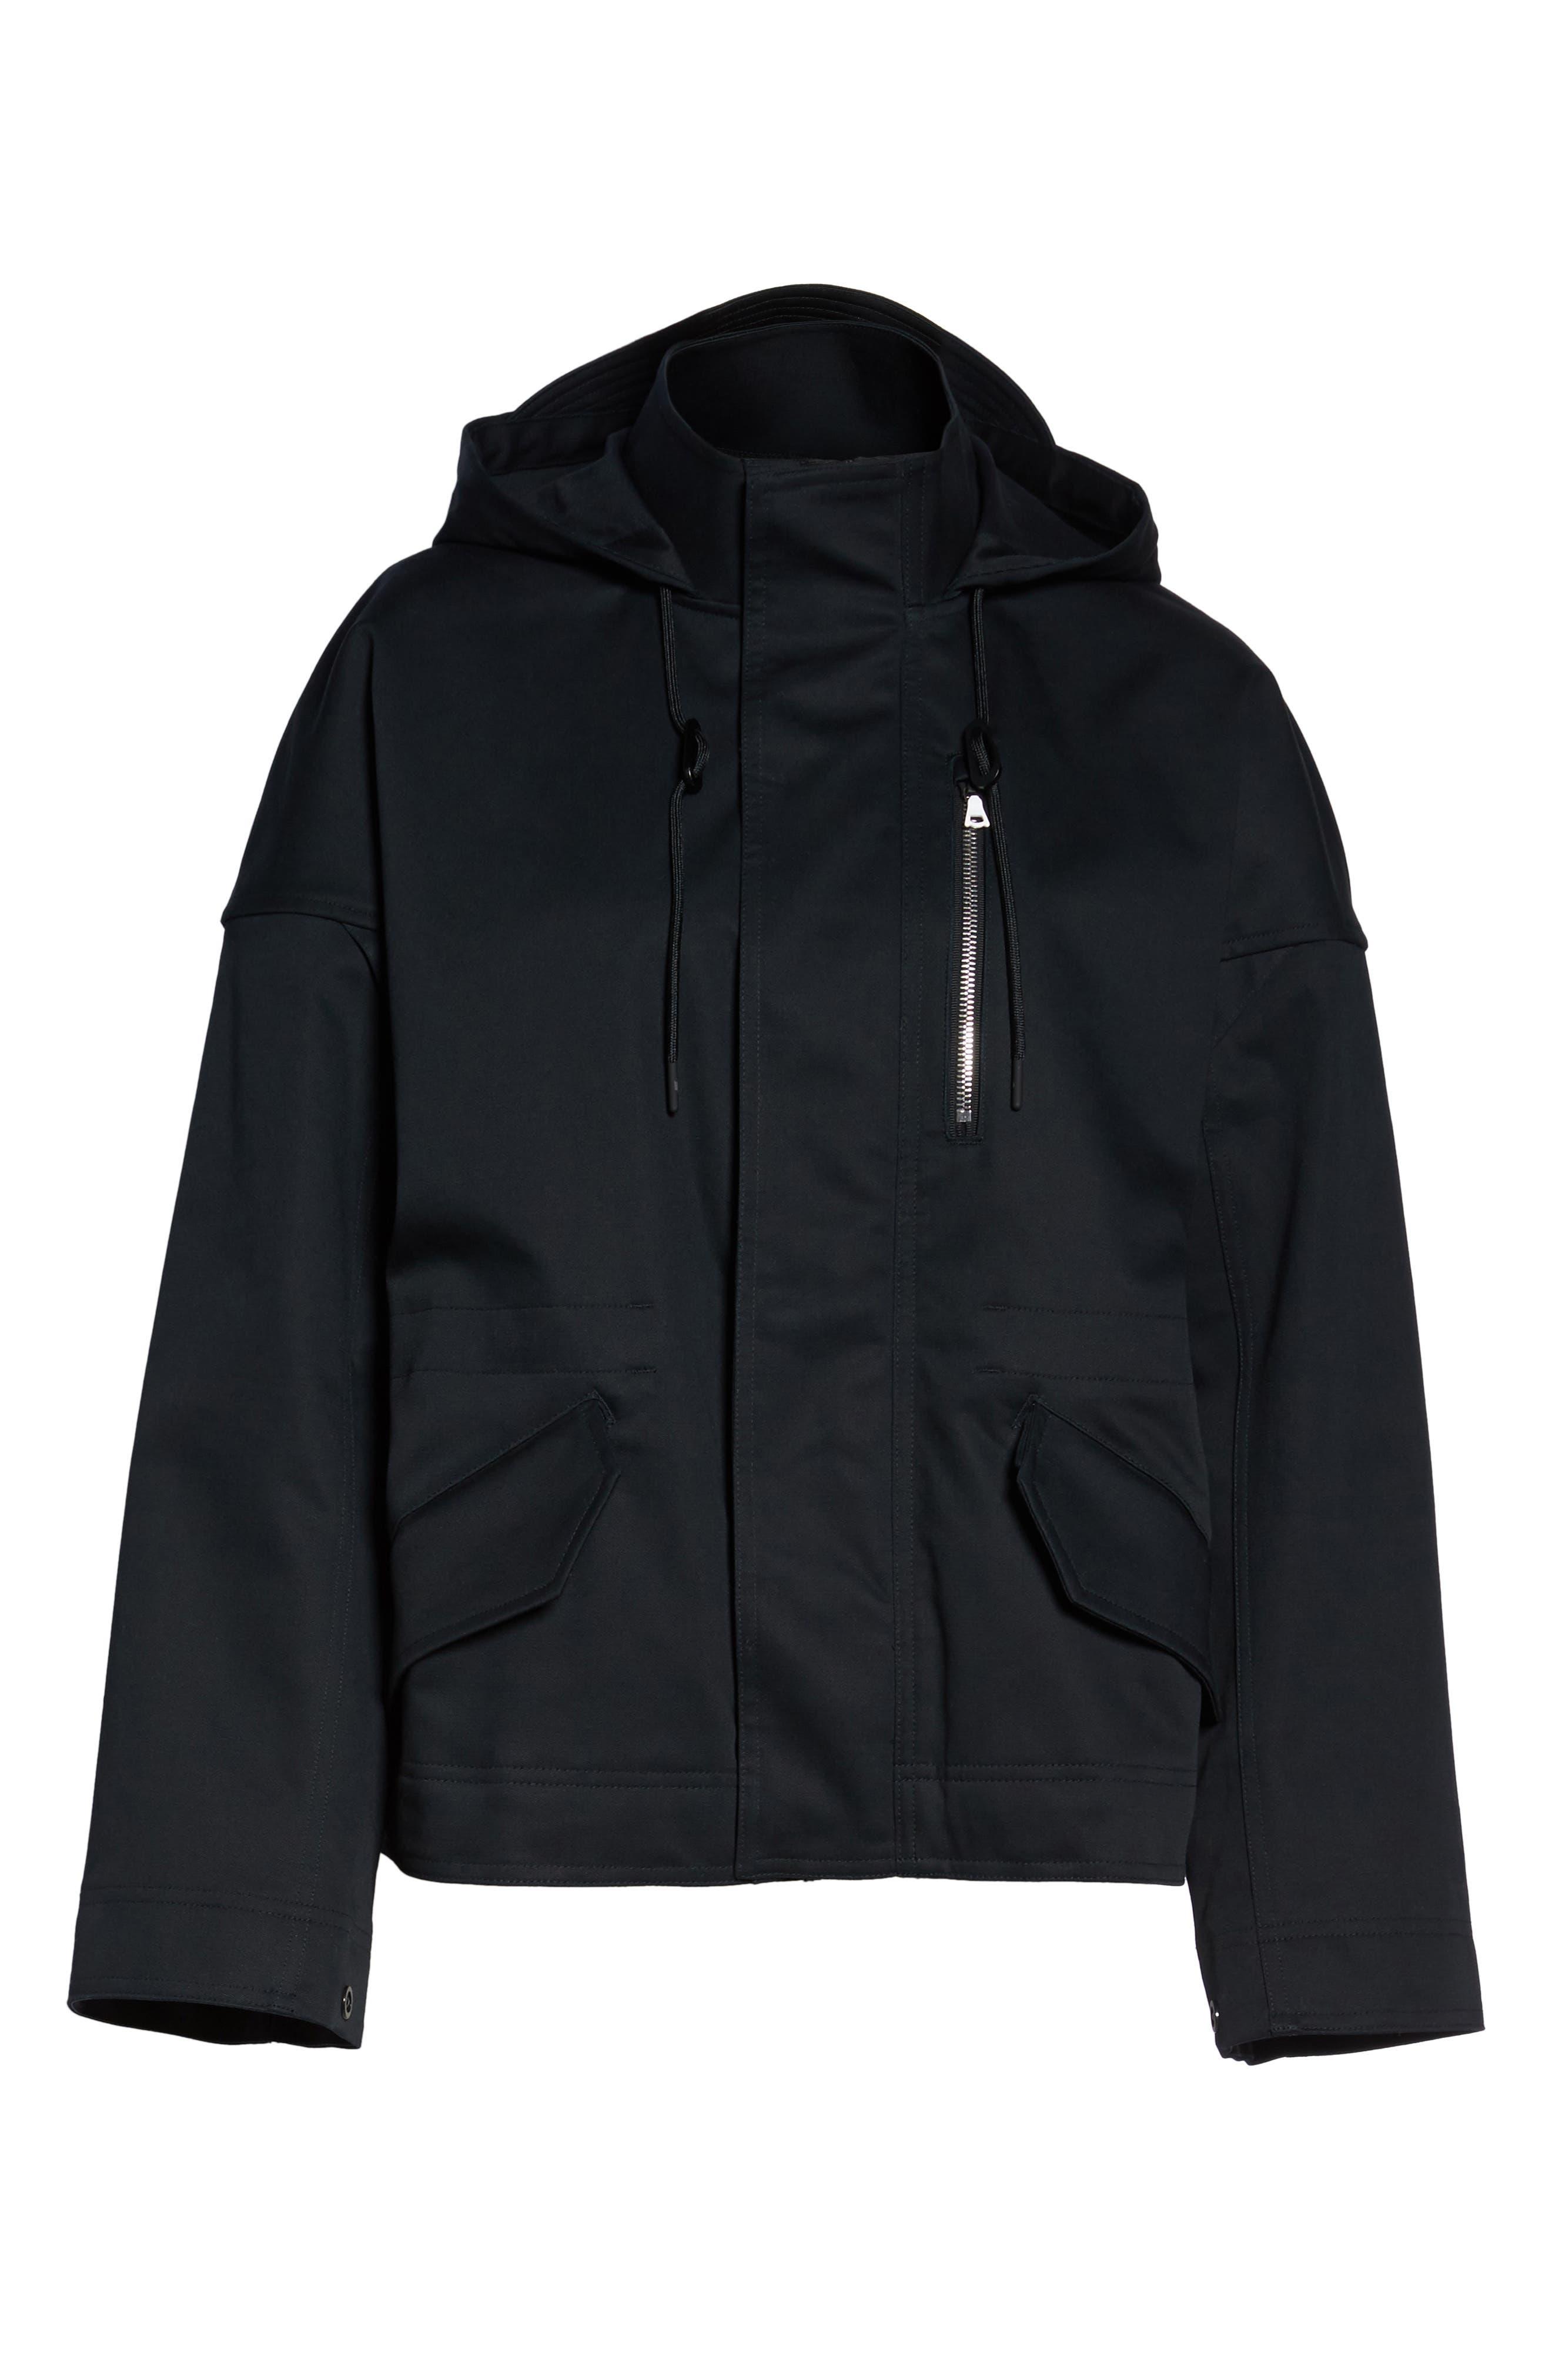 NikeLab Collection Women's Tactical Jacket,                             Alternate thumbnail 6, color,                             Black/ Black